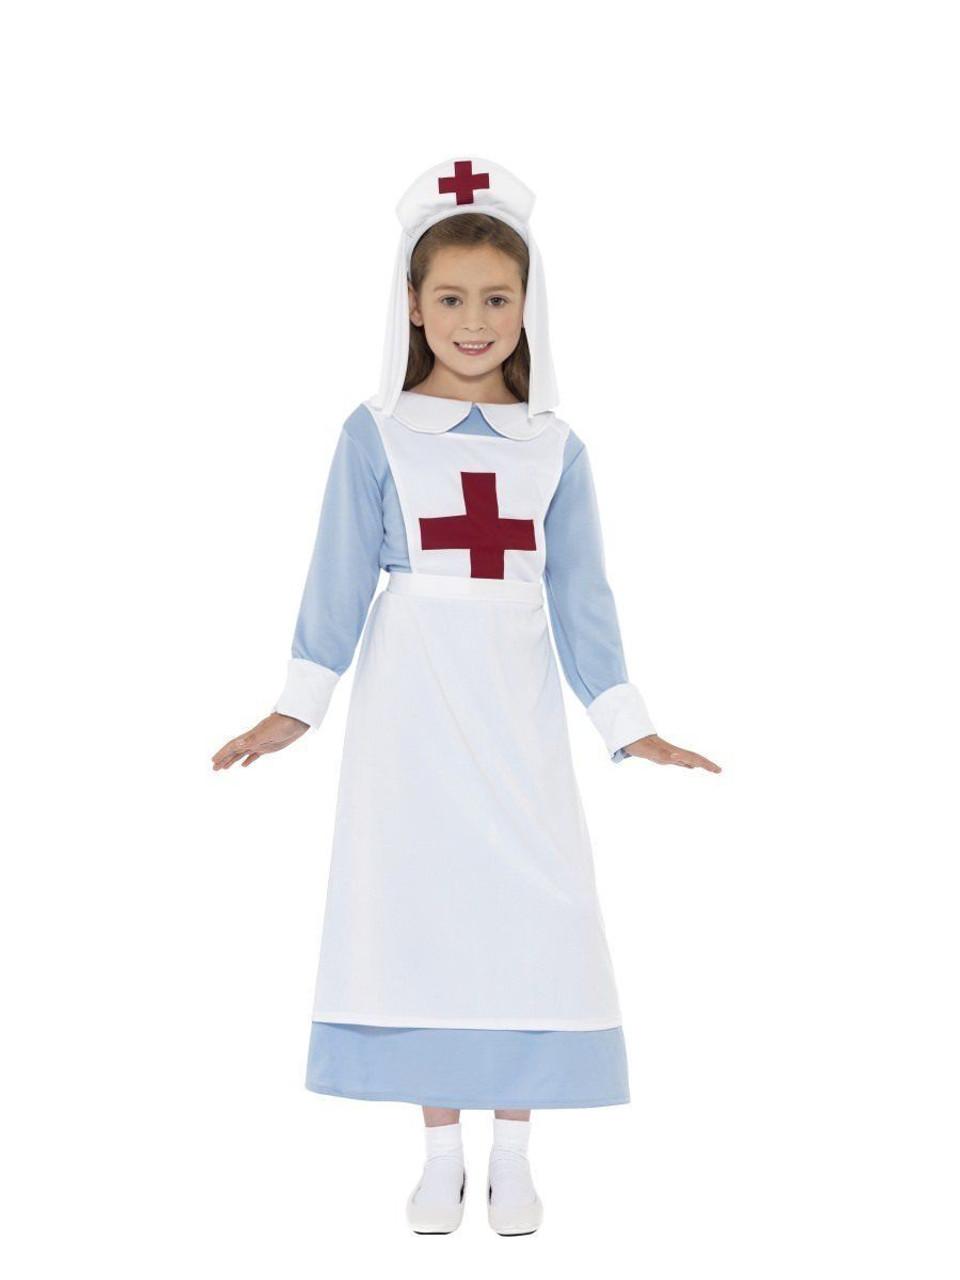 752822db20f22 Smiffys WW1 World War 1 Nurse First Aid Child Girls Halloween Costume 44026